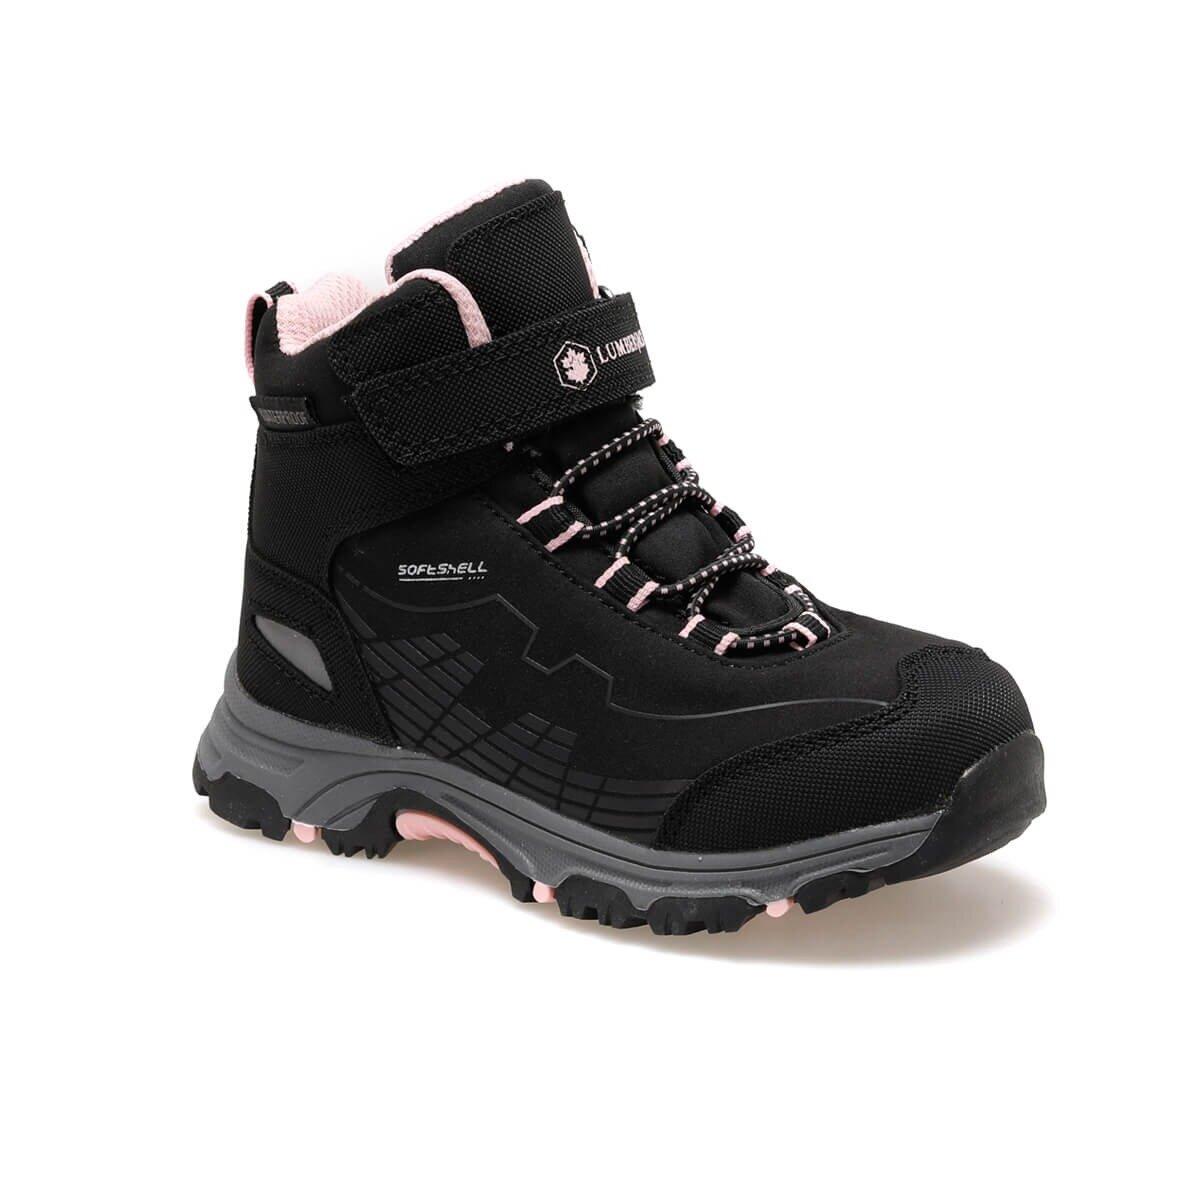 FLO CHAMP HI 9PR Black Girls Child Outdoors Boots LUMBERJACK